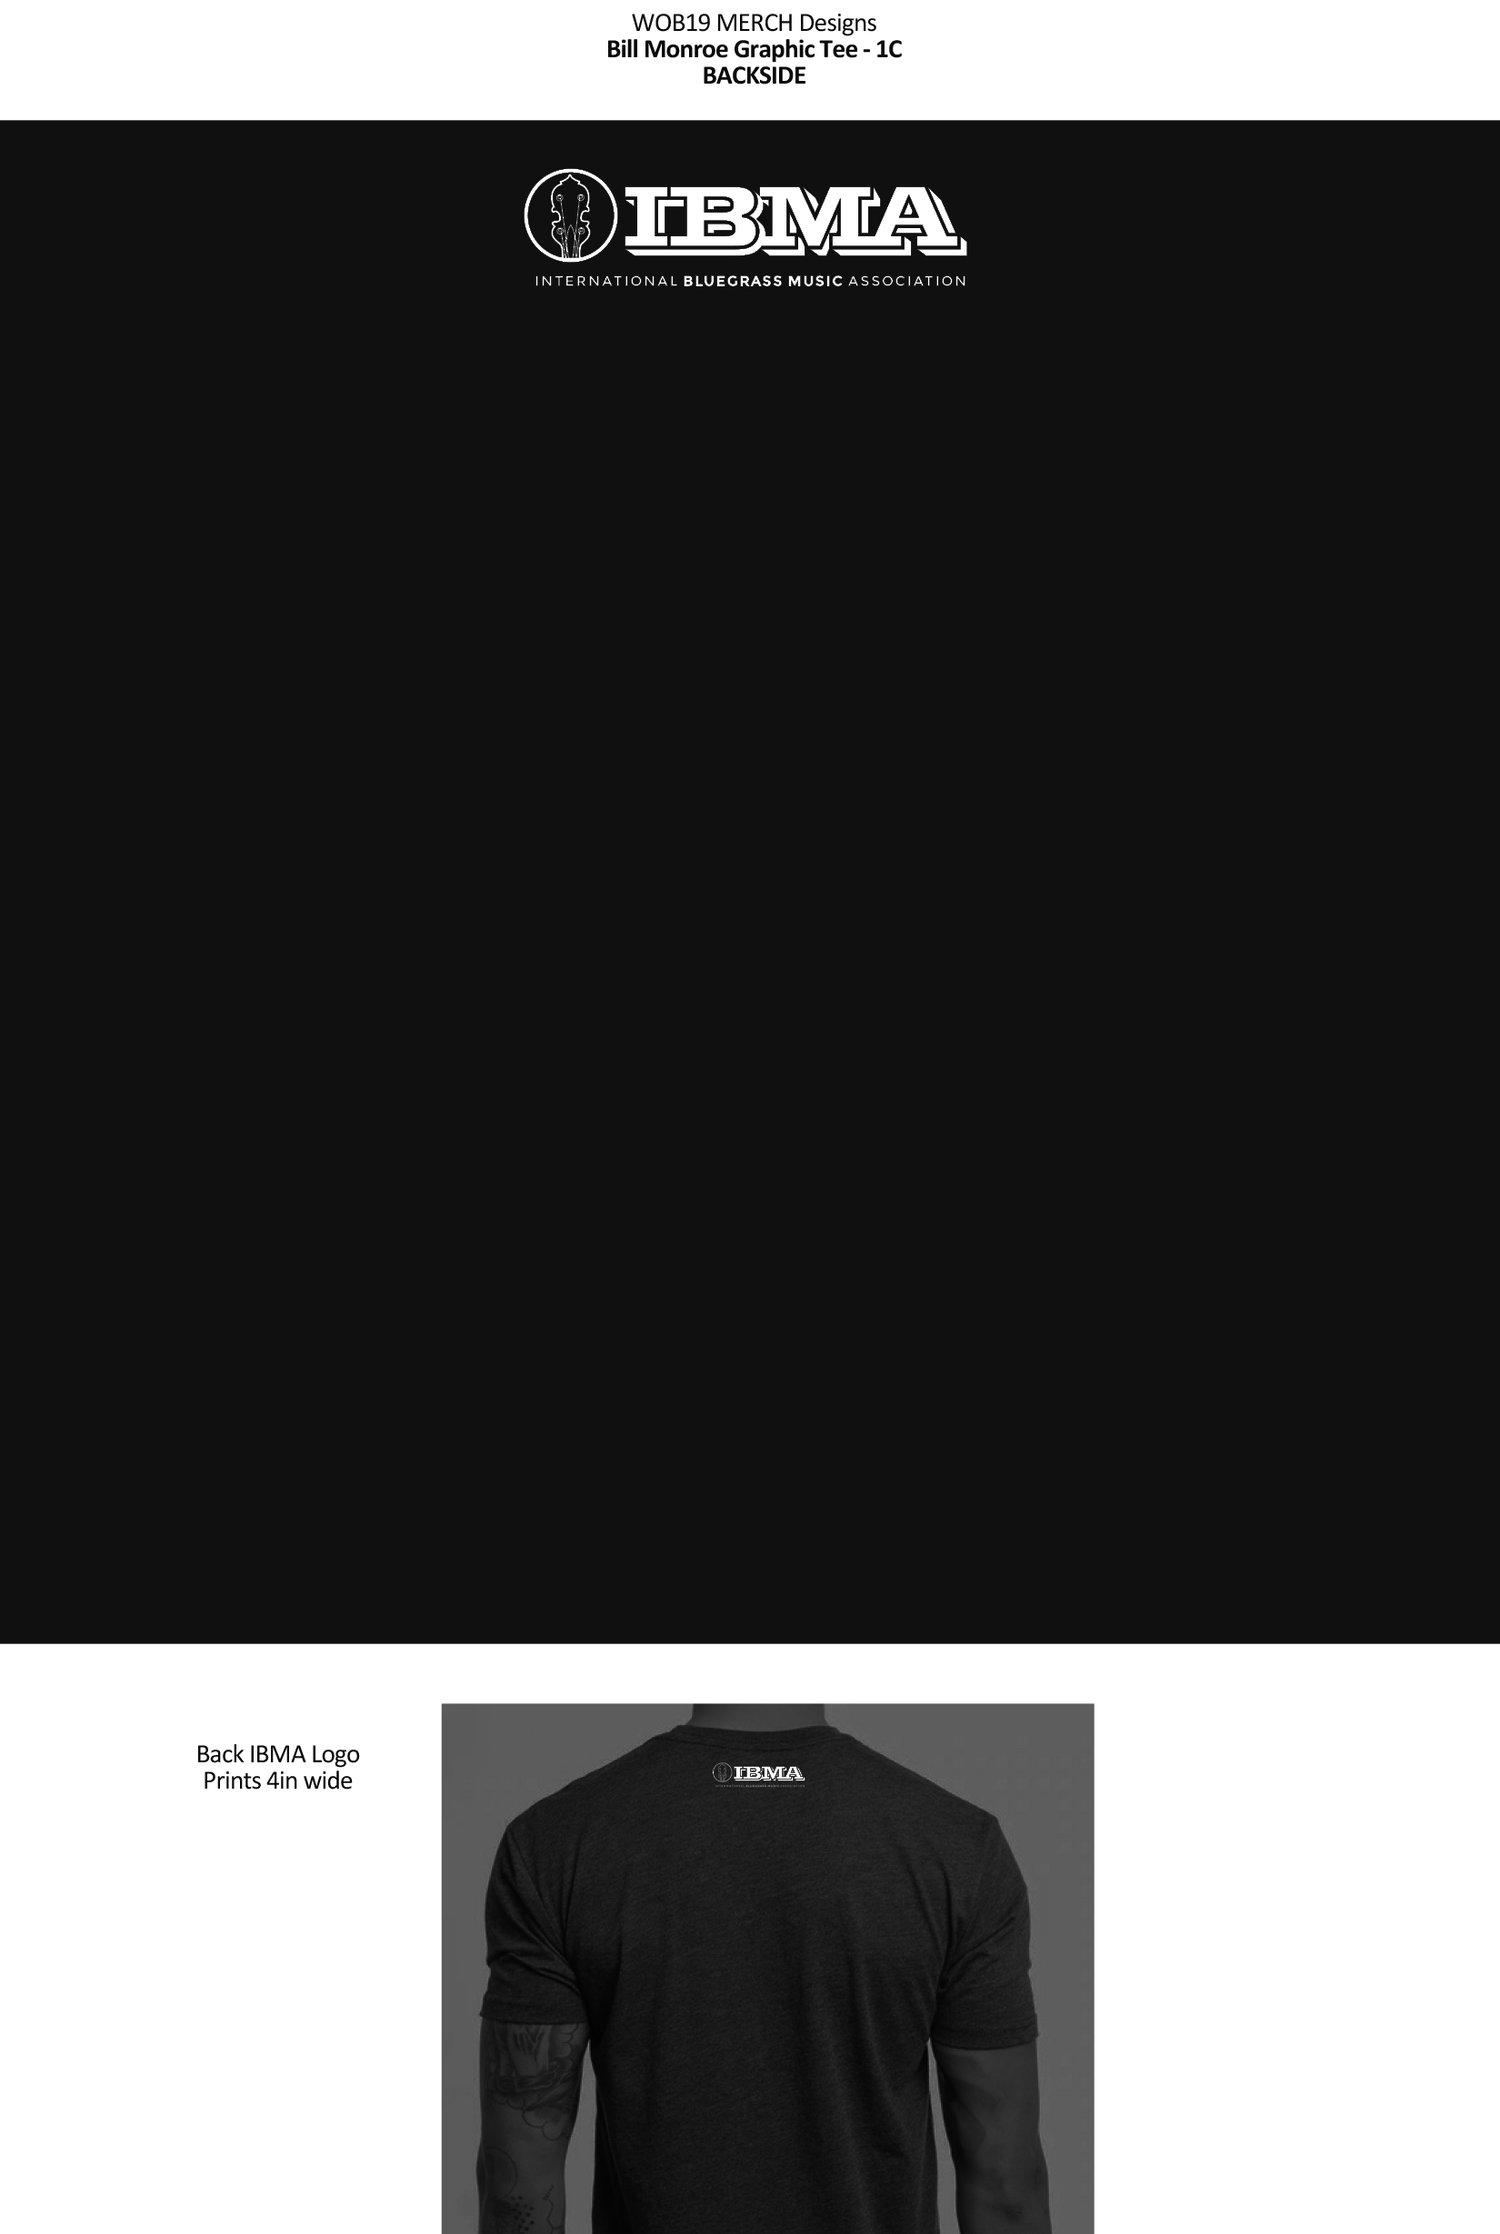 Image of Bill Monroe IBMA Ladies Shirts